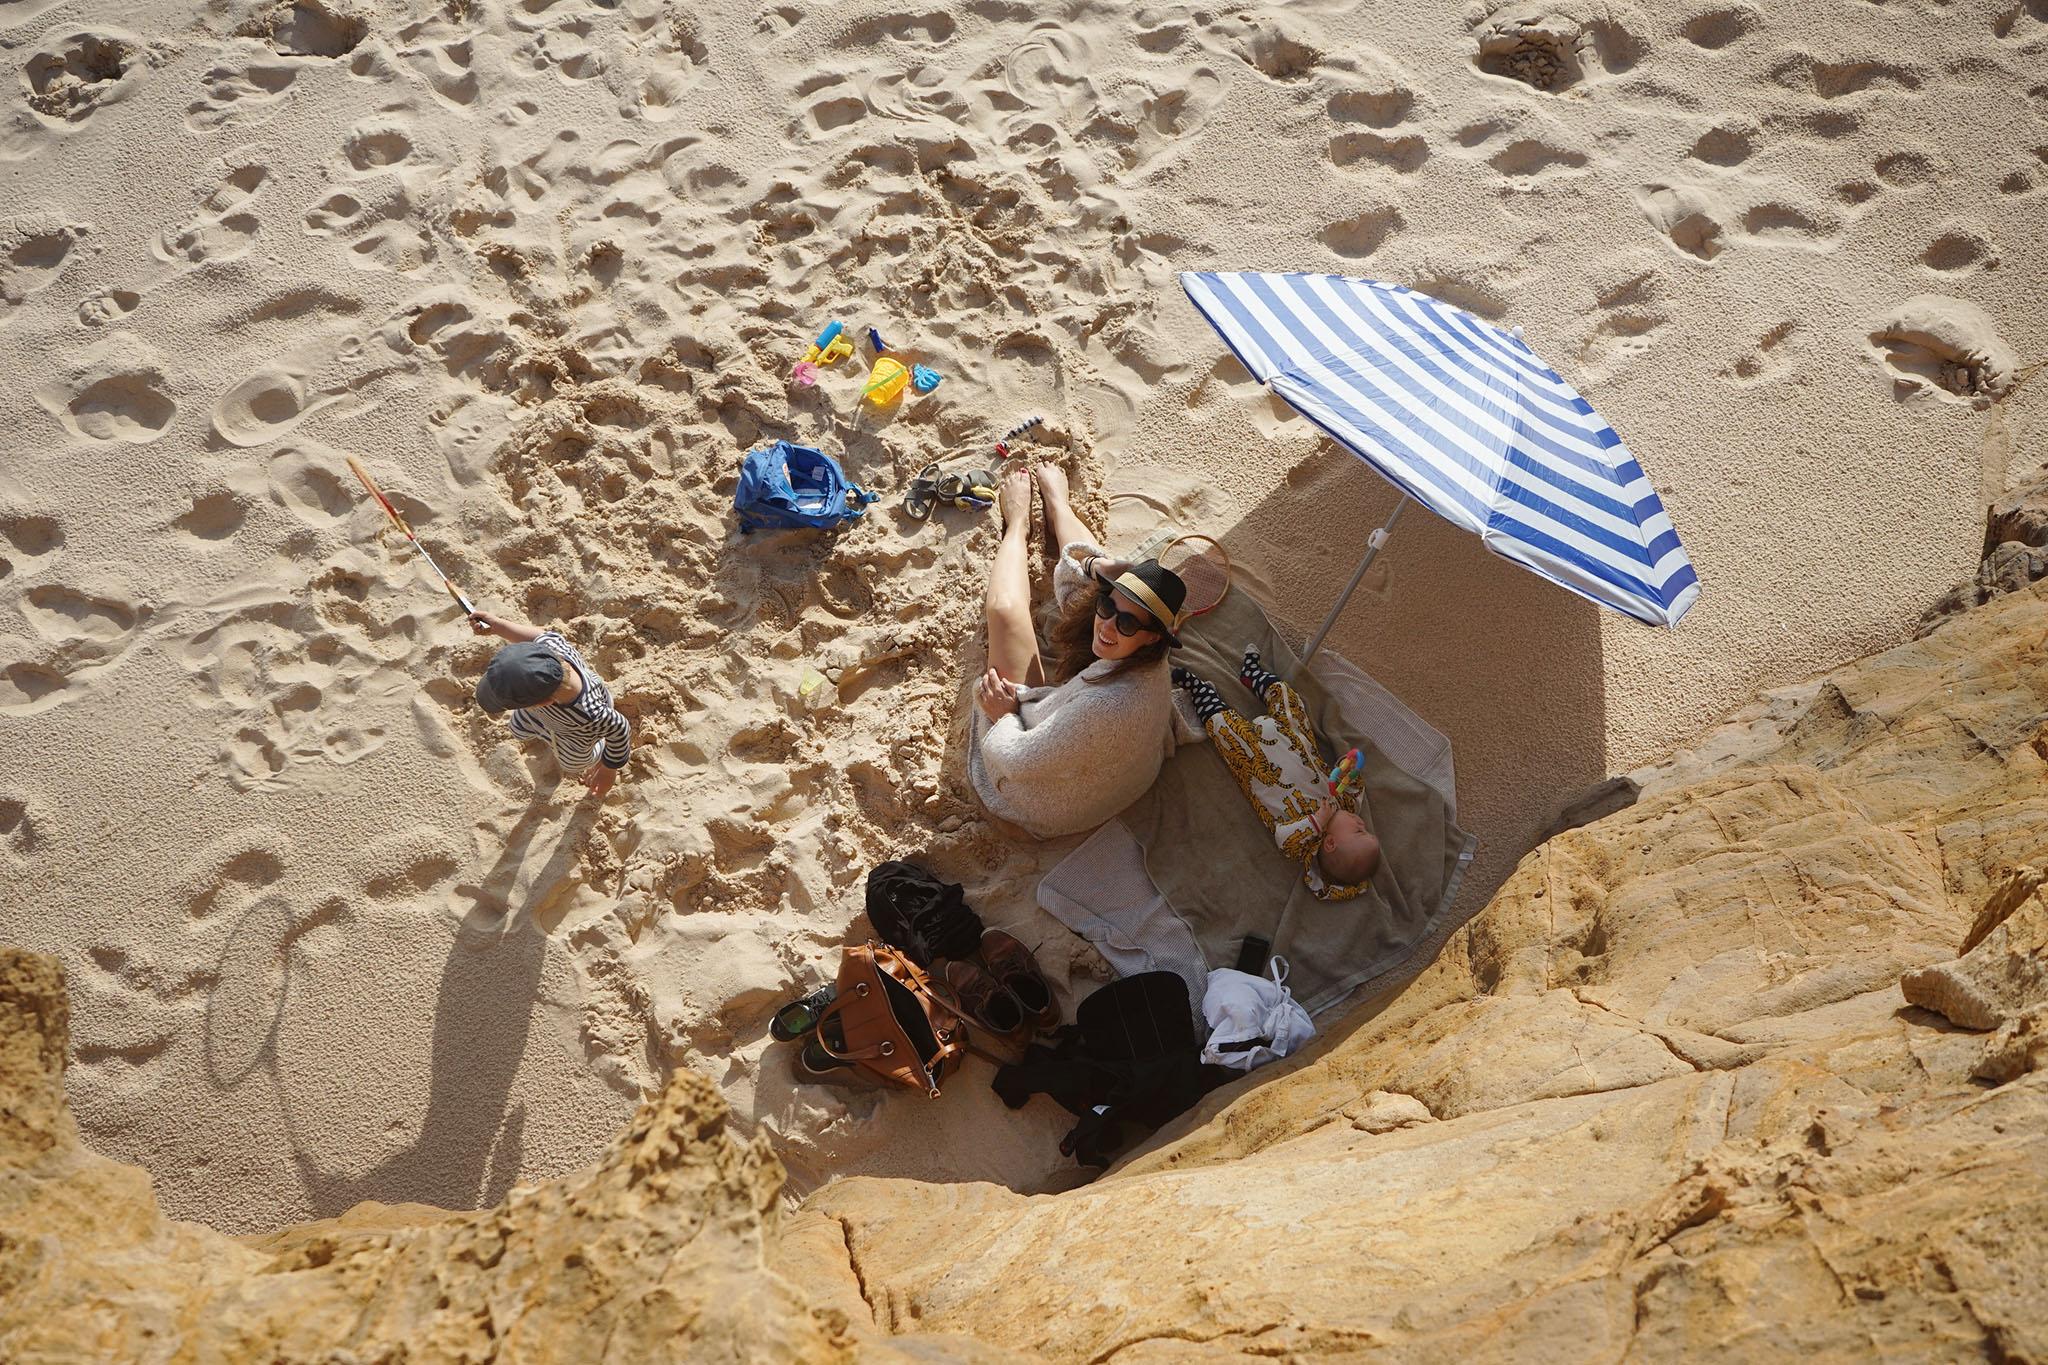 2017-04-Casas-da-Cerca-Portugal - casas-da-cerca-portugal-nectarandpulse-beach-63.jpg